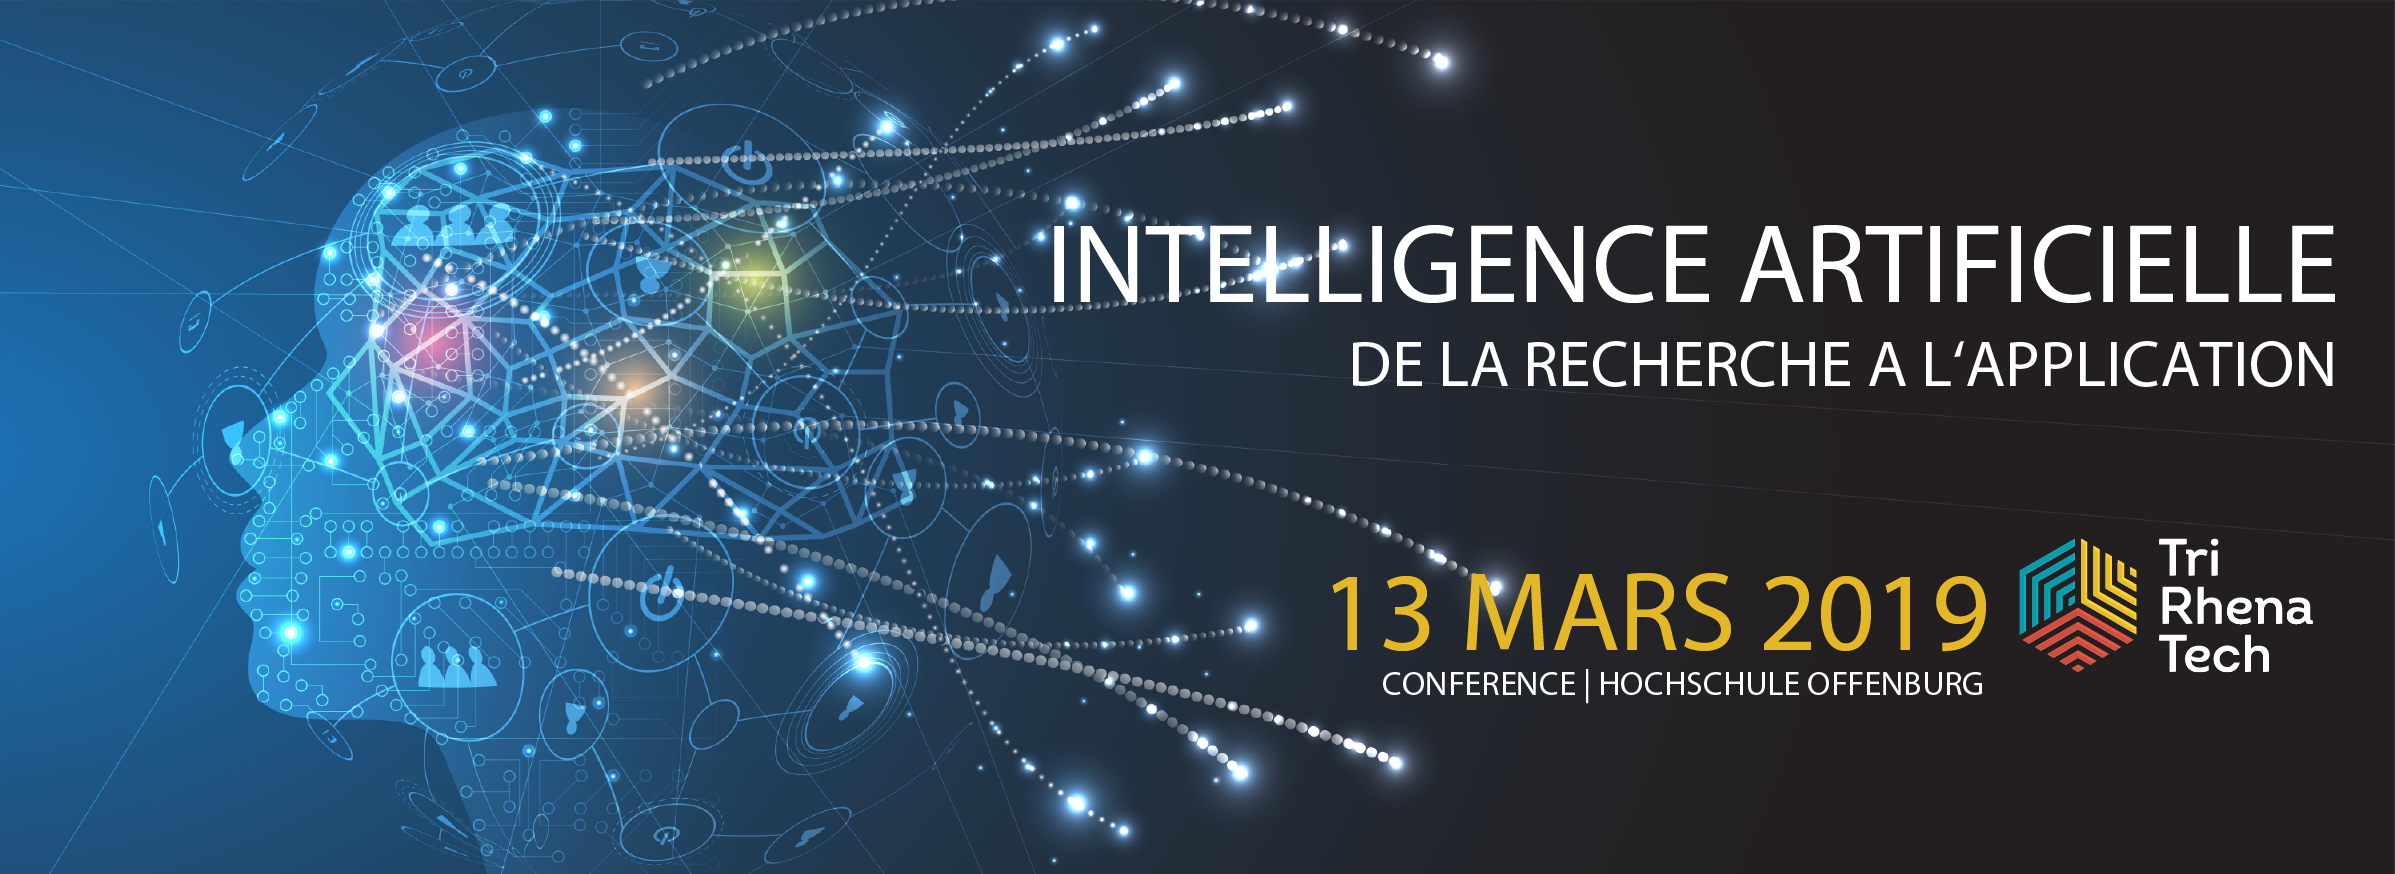 footer_text_kikonferenz-FR.png